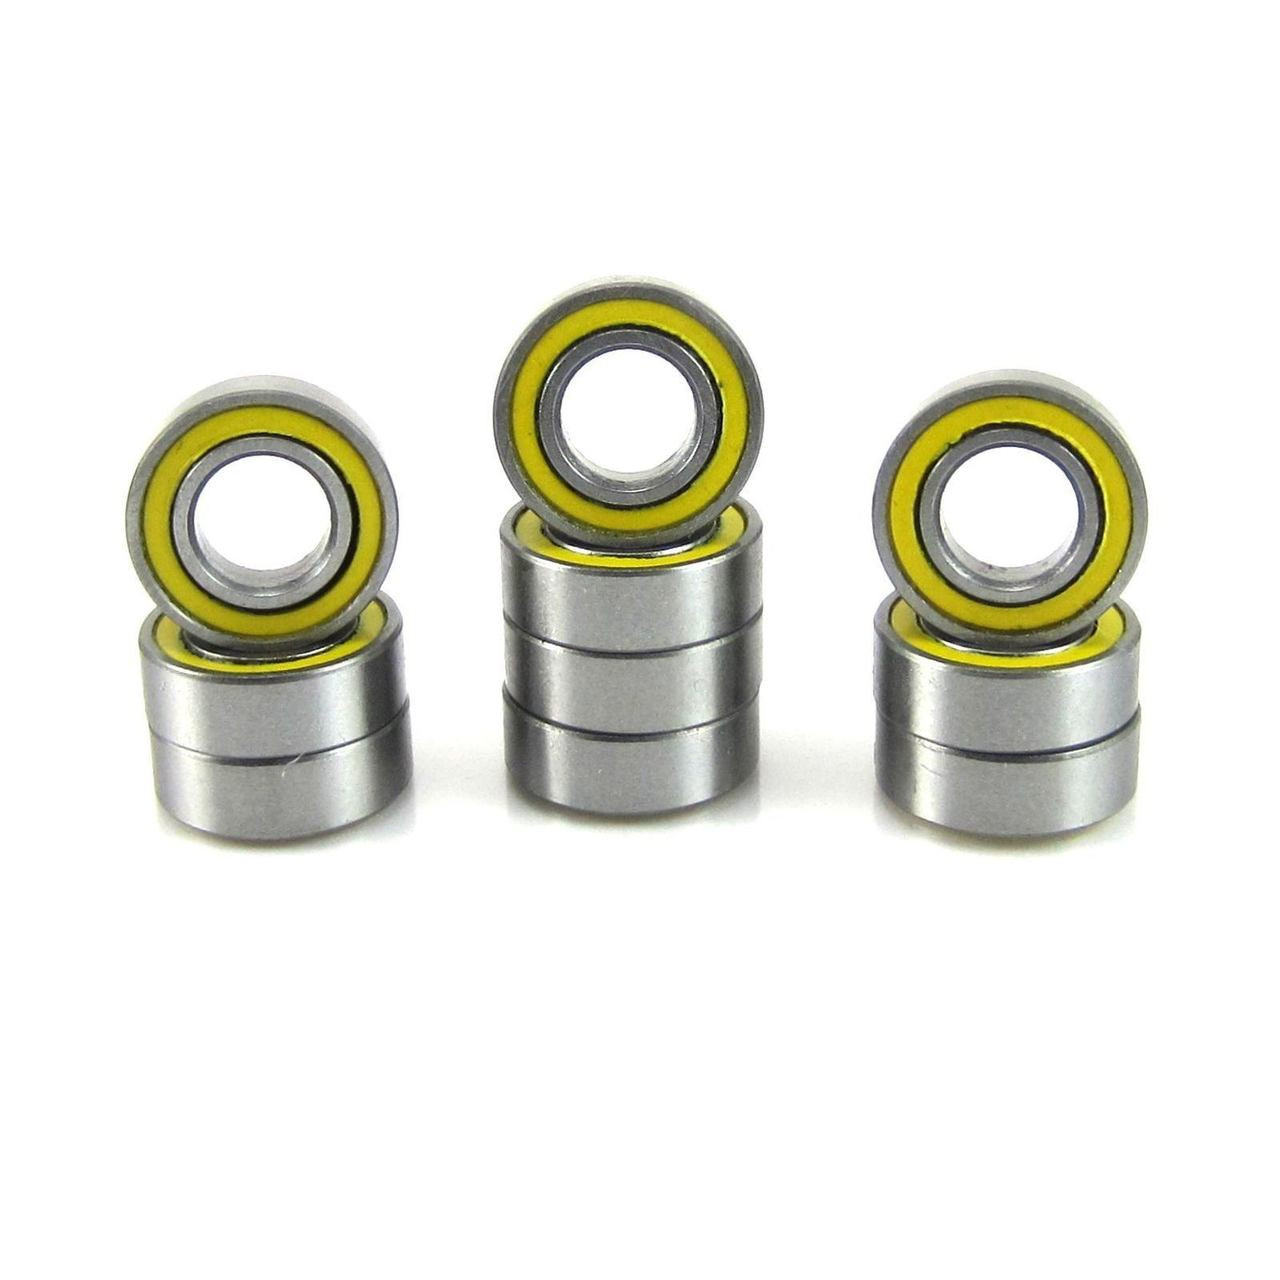 TRB RC 3/16x3/8x1/8 Precision Ball Bearings ABEC 3 YEL Rubber Sealed (10)